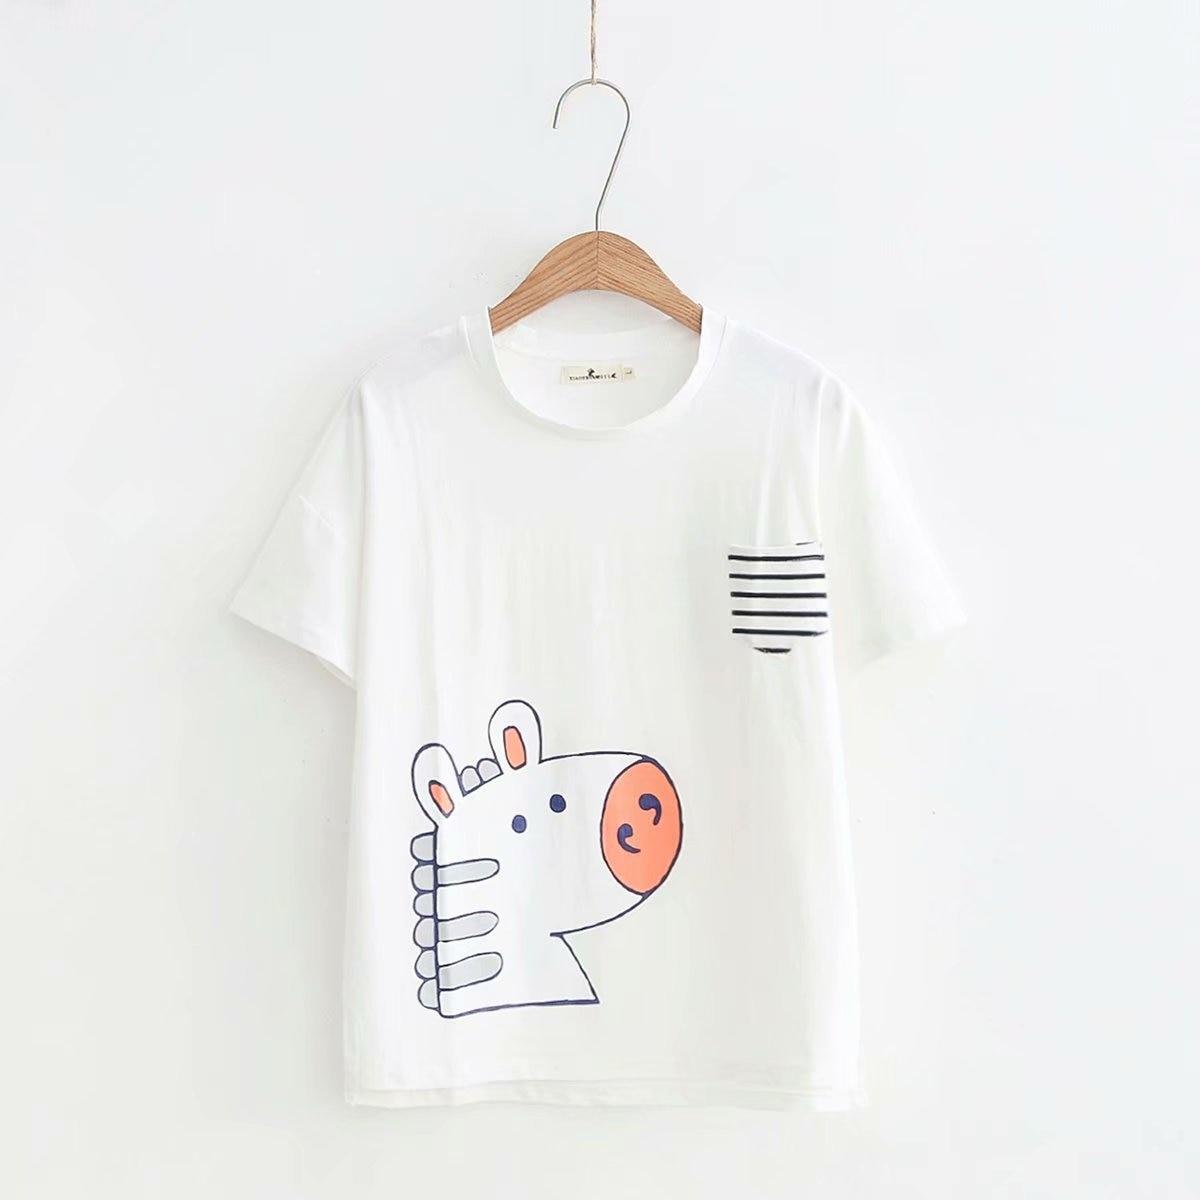 2019 New T Shirt Short Sleeves T Shirts Summer  Cotton  T-shirt Plus Size